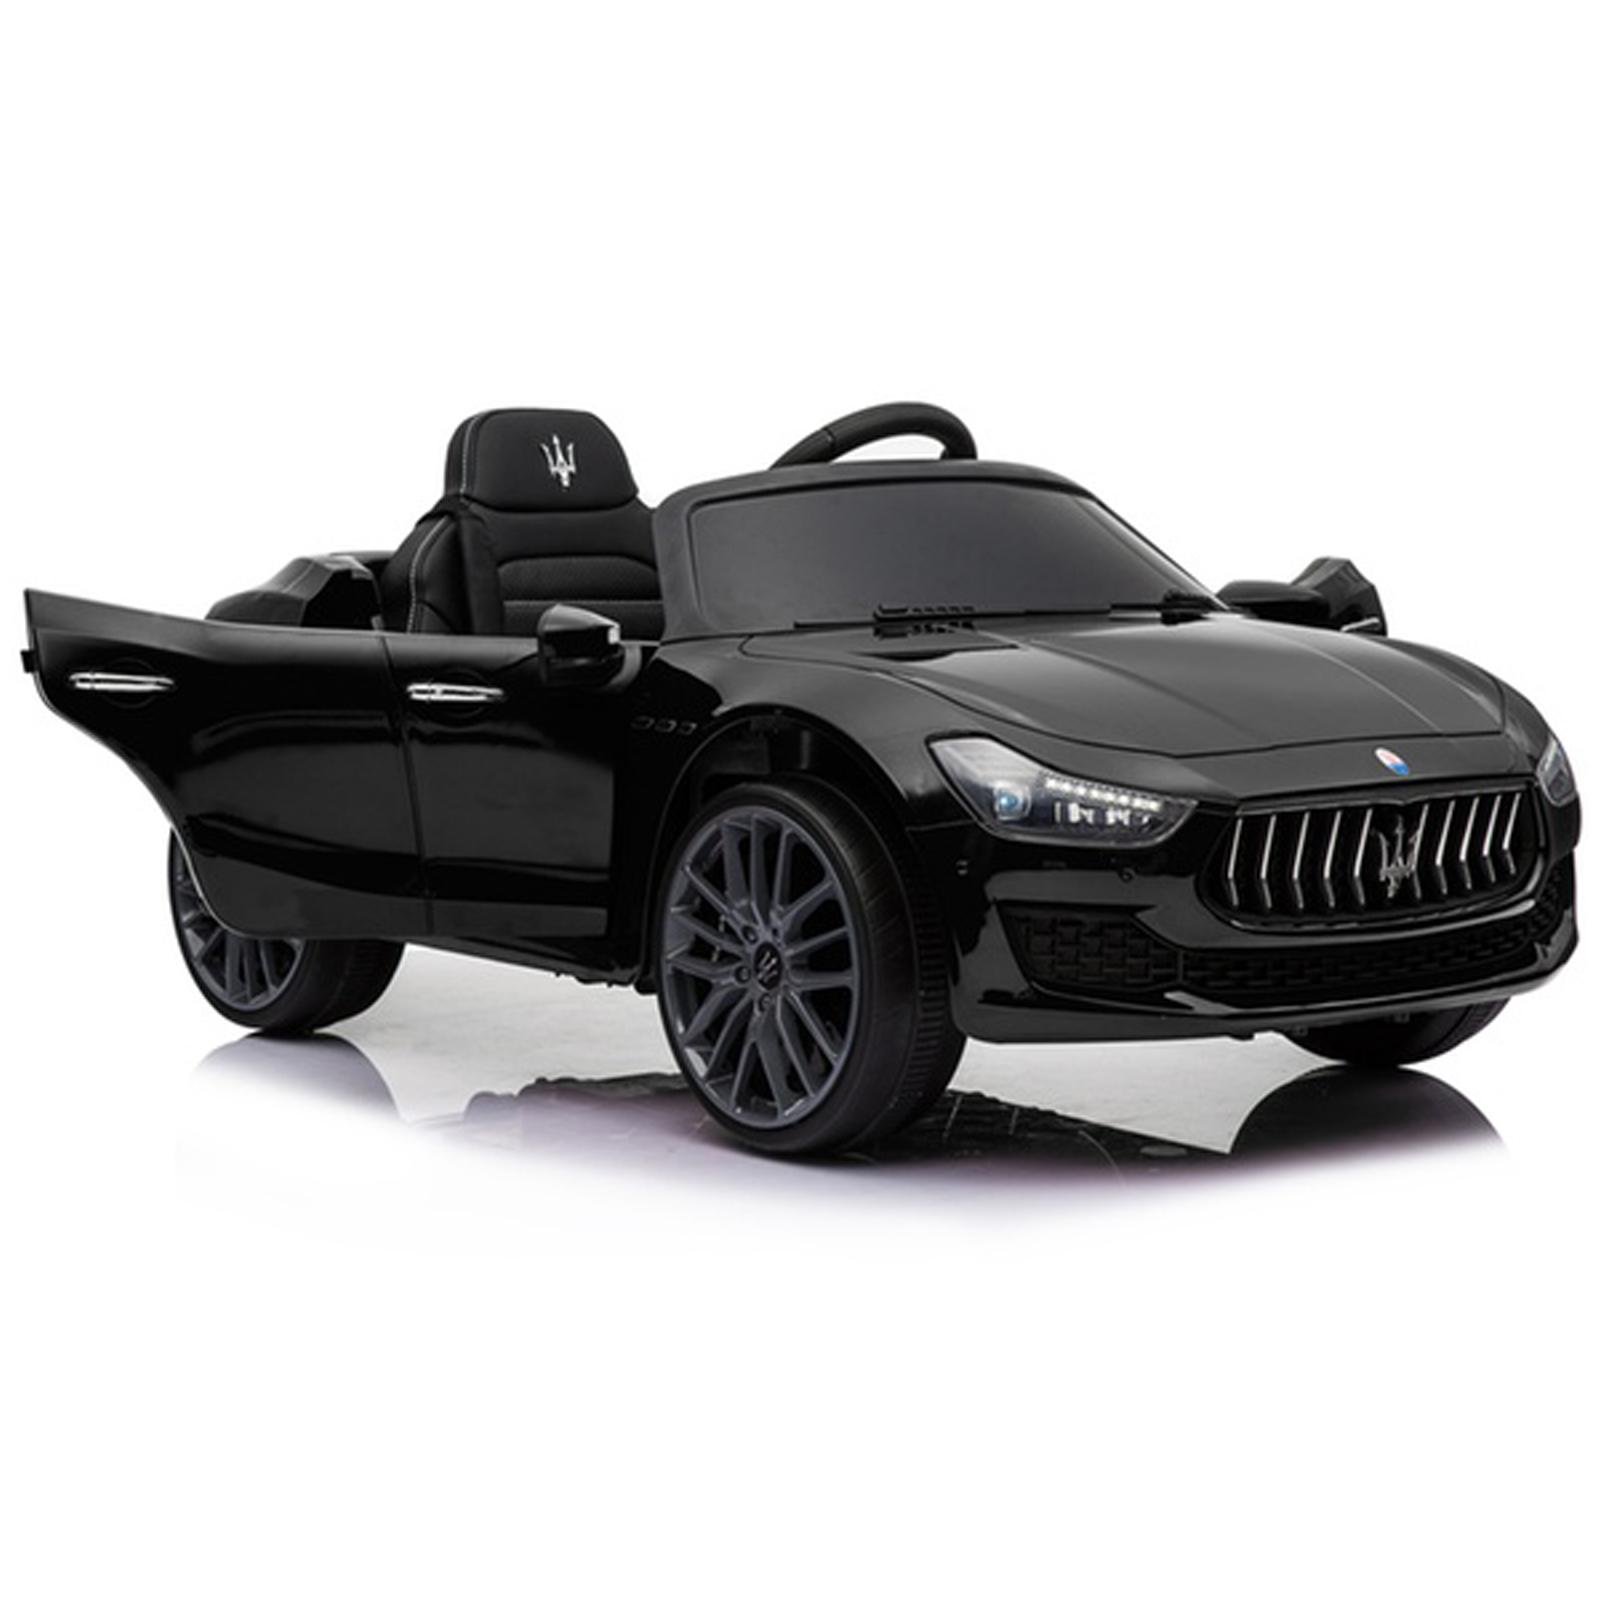 Kidplay Licensed Maserati Ghibli Kids Ride On Car 12V Battery Powered - Black